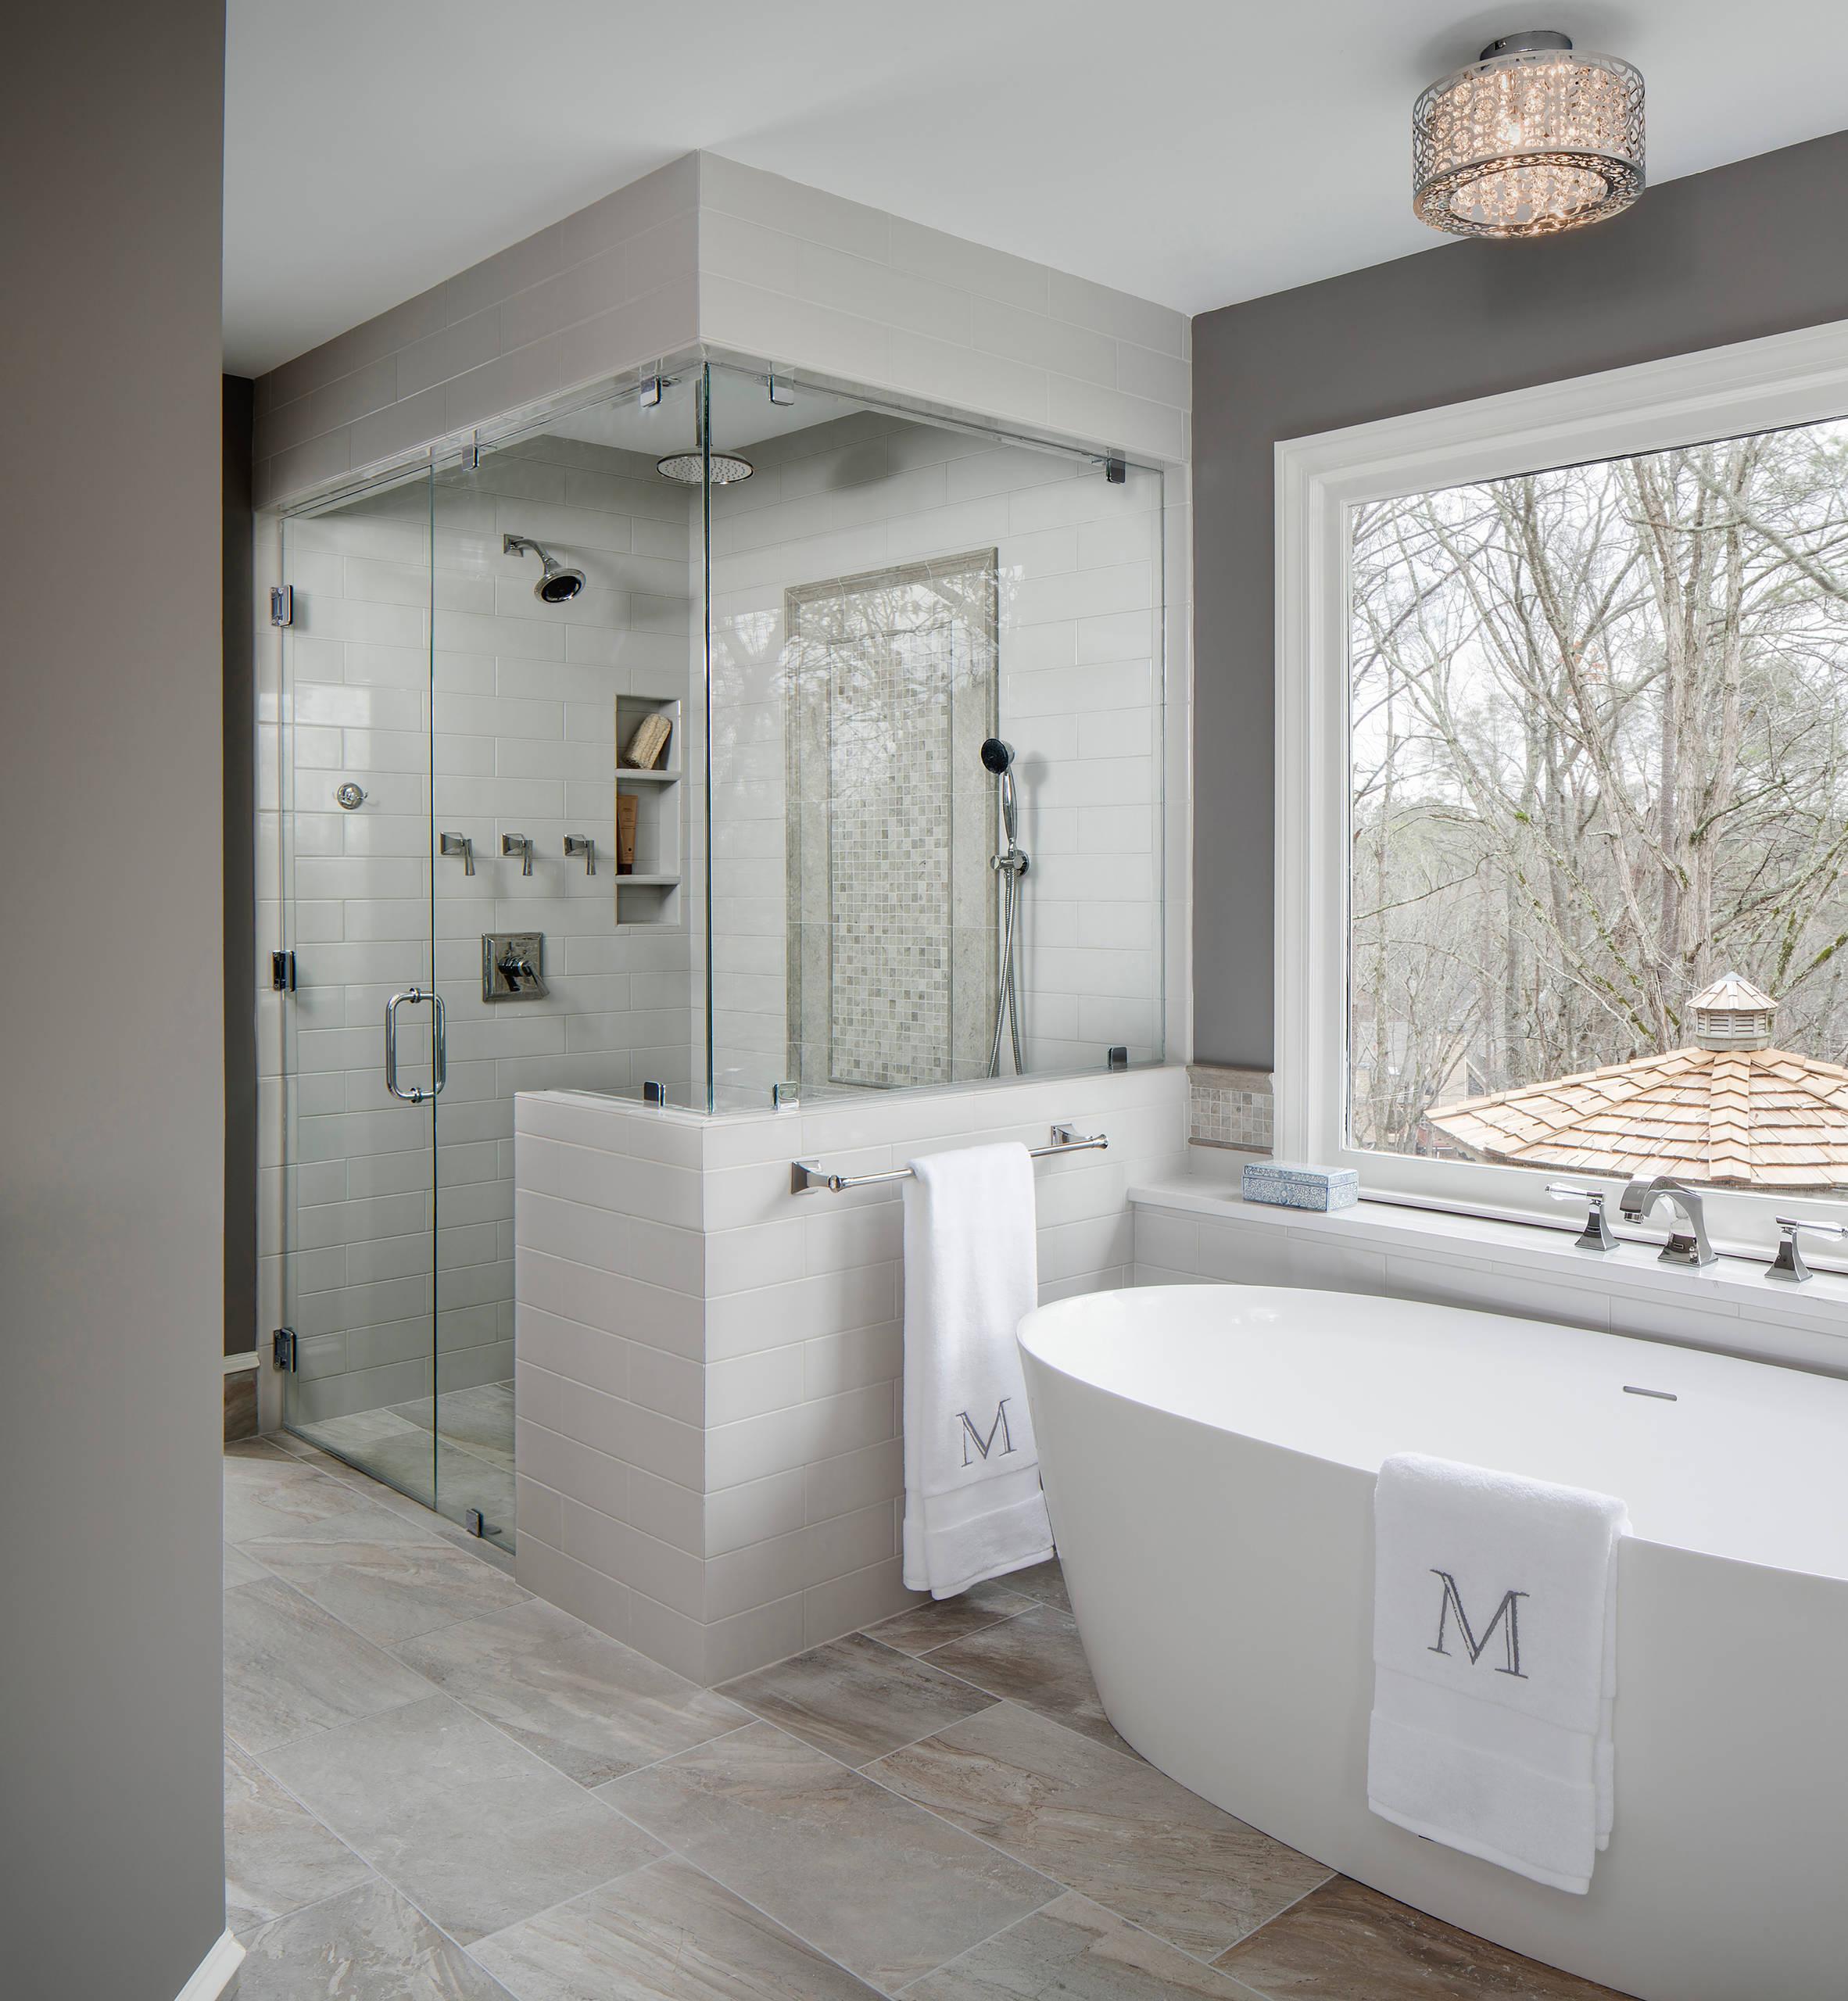 75 Beautiful Ceramic Tile Bathroom Pictures Ideas February 2021 Houzz